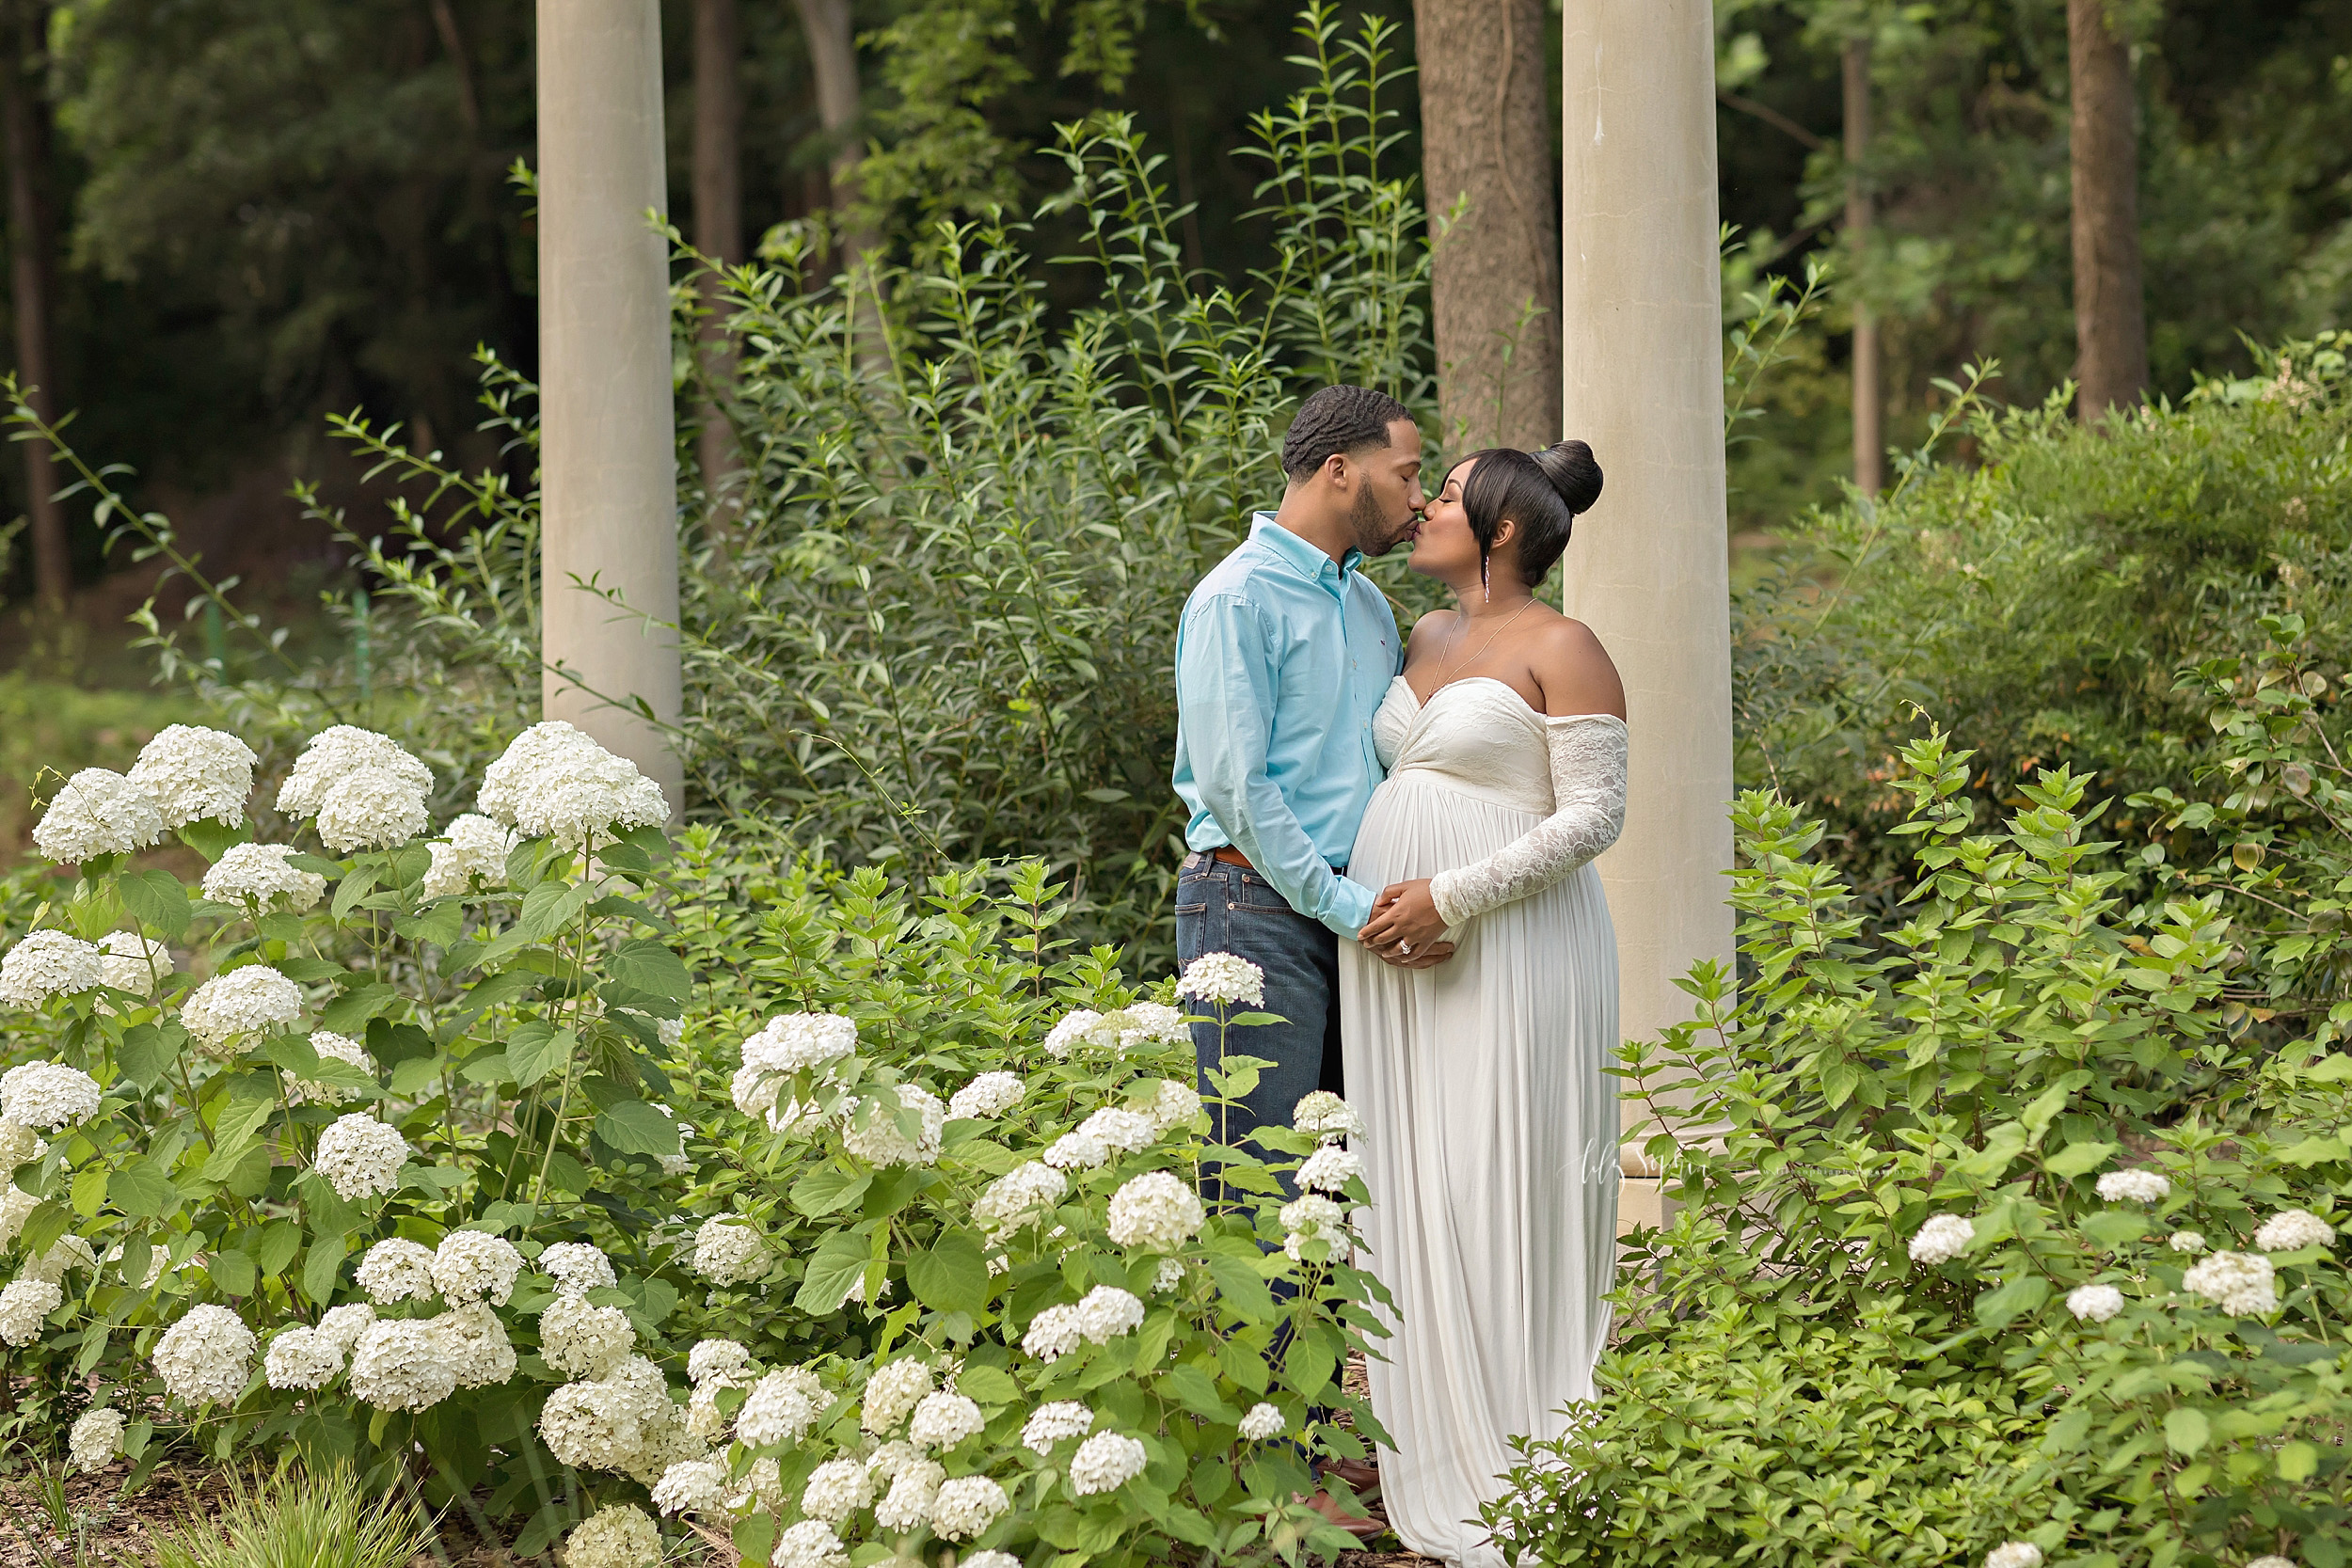 atlanta-buckhead-acworth-brookhaven-lily-sophia-photography-baby-maternity-photographer-maternity-portraits-outdoor-gardens-sunset-grant-park-intown-pregnant-expecting-baby-boy_0220.jpg